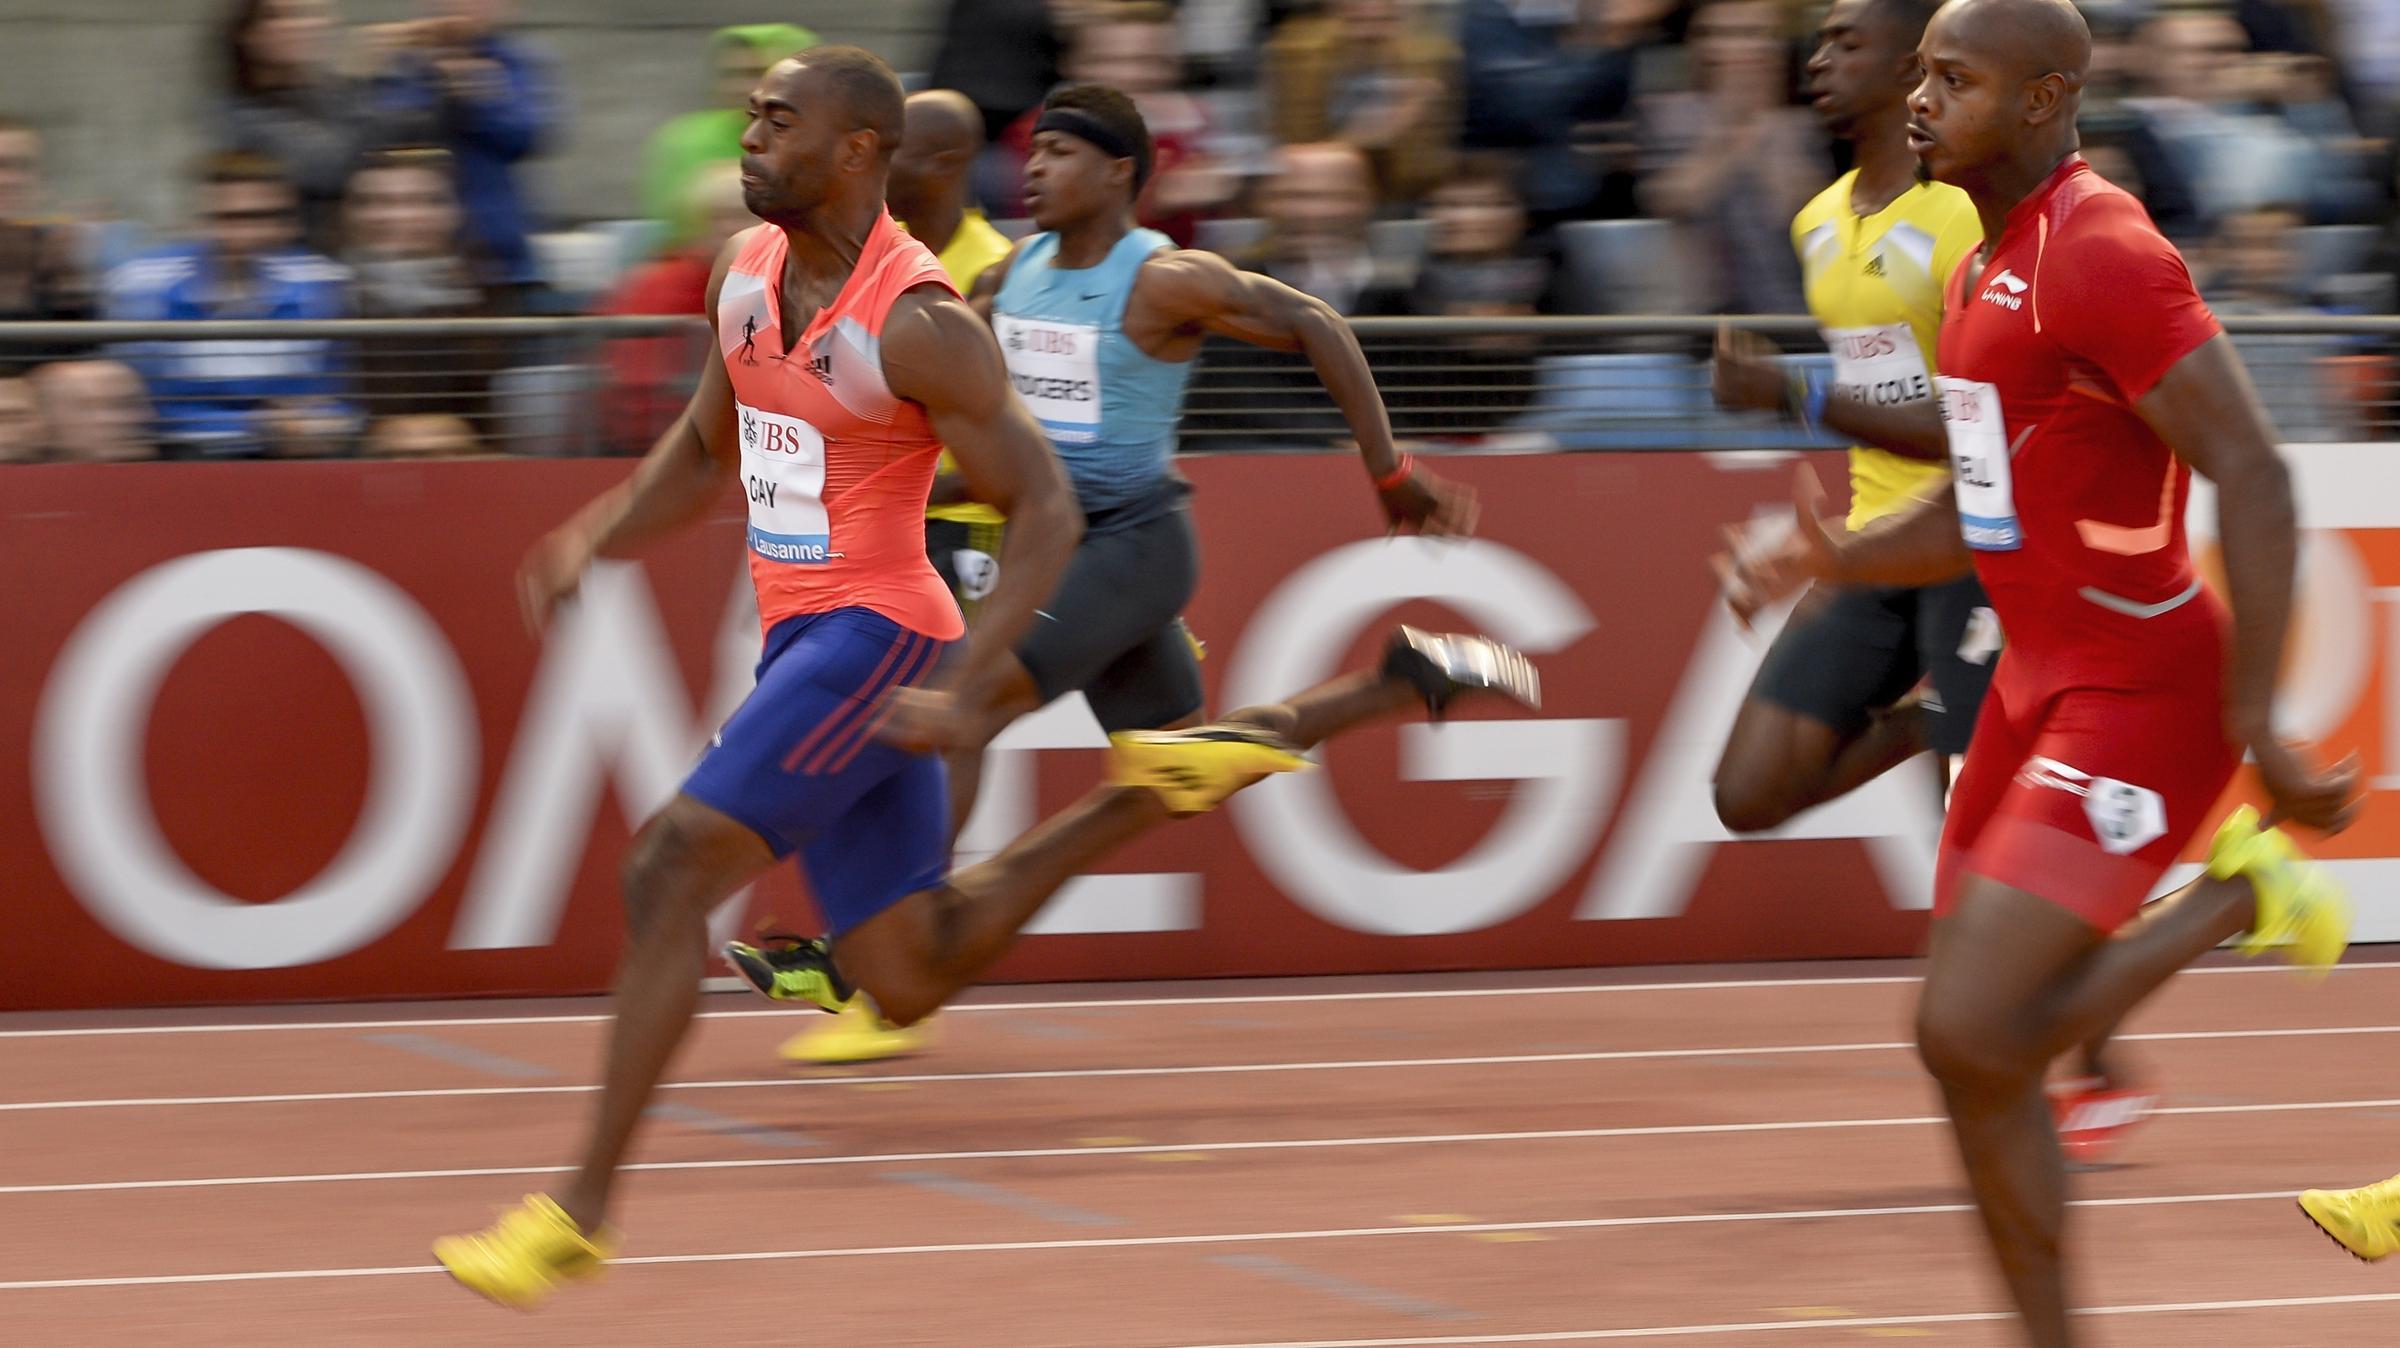 Report Links Sprinter Tyson Gay's Doping To Anti-Aging Cream